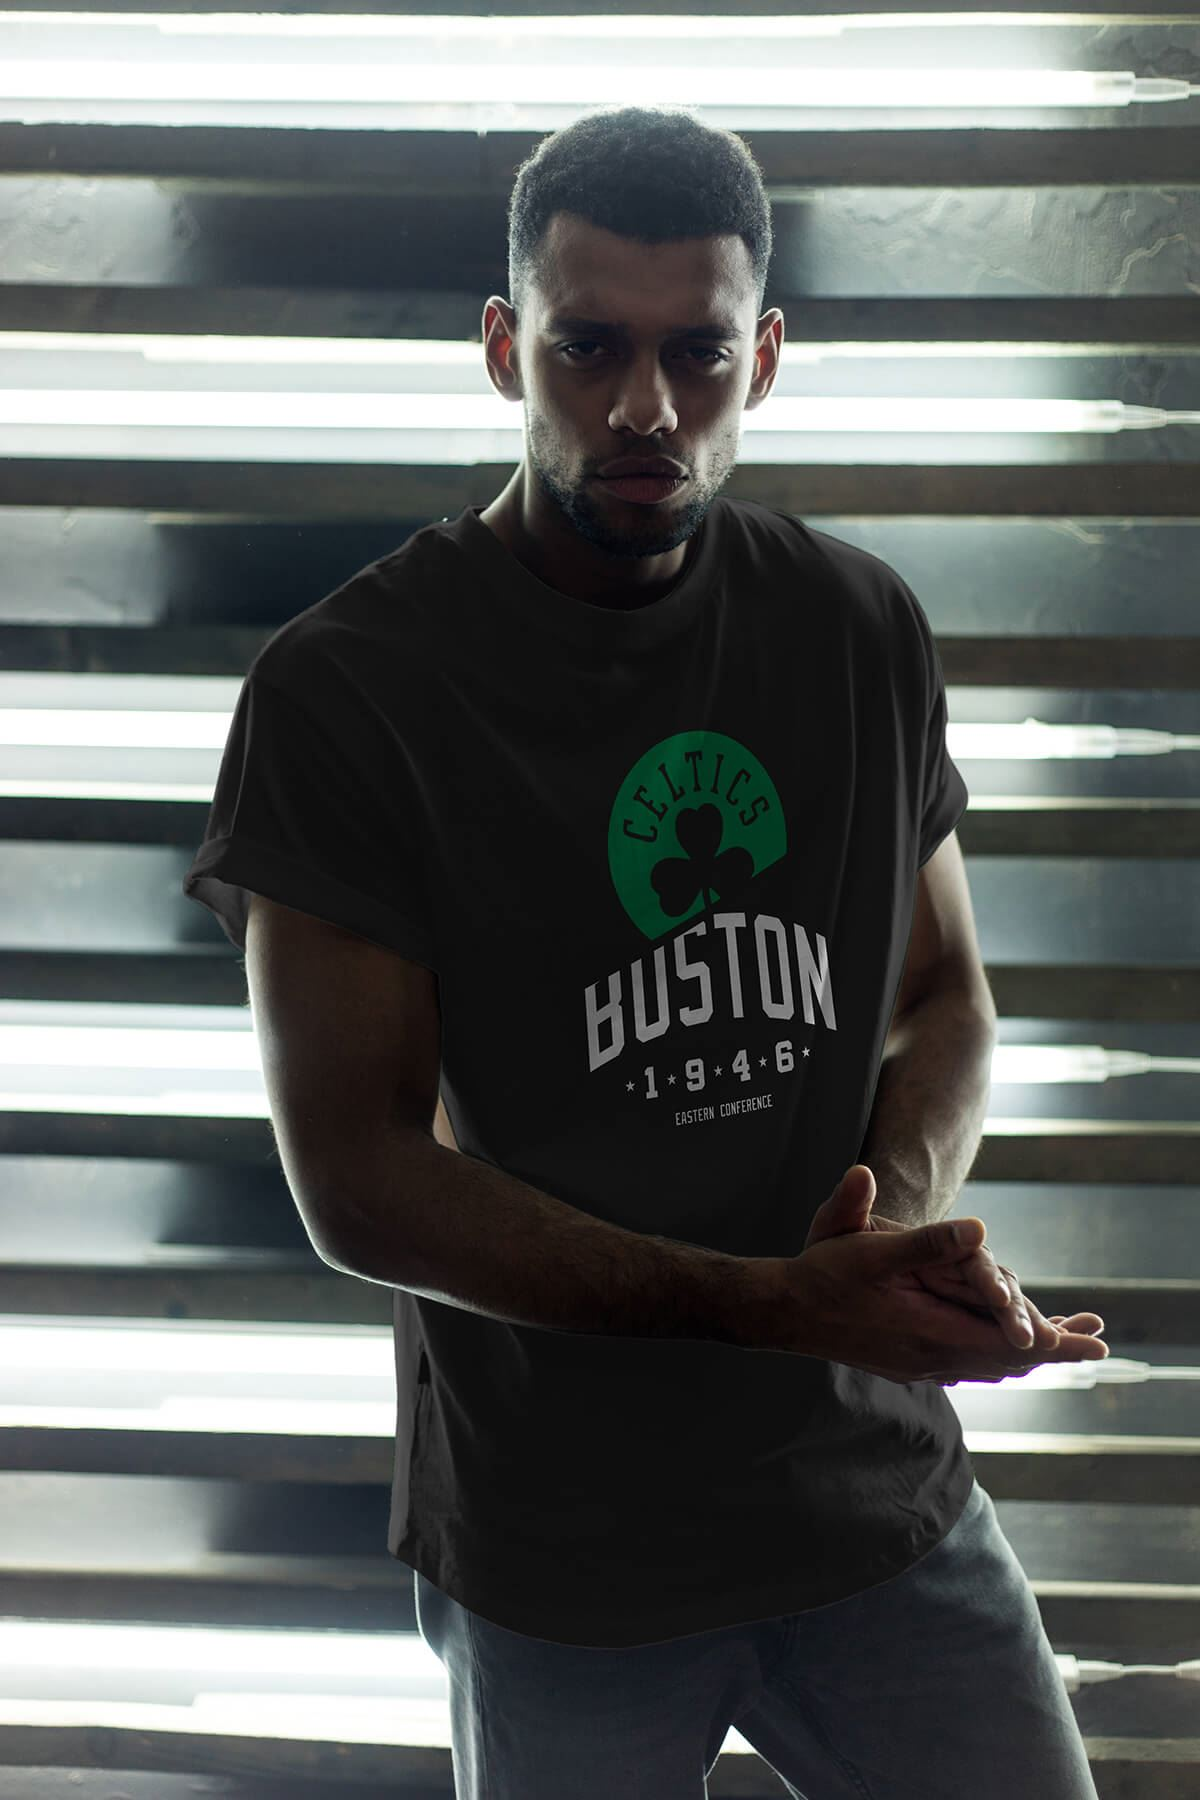 Boston Celtics 24 Siyah Erkek Oversize Tshirt - Tişört